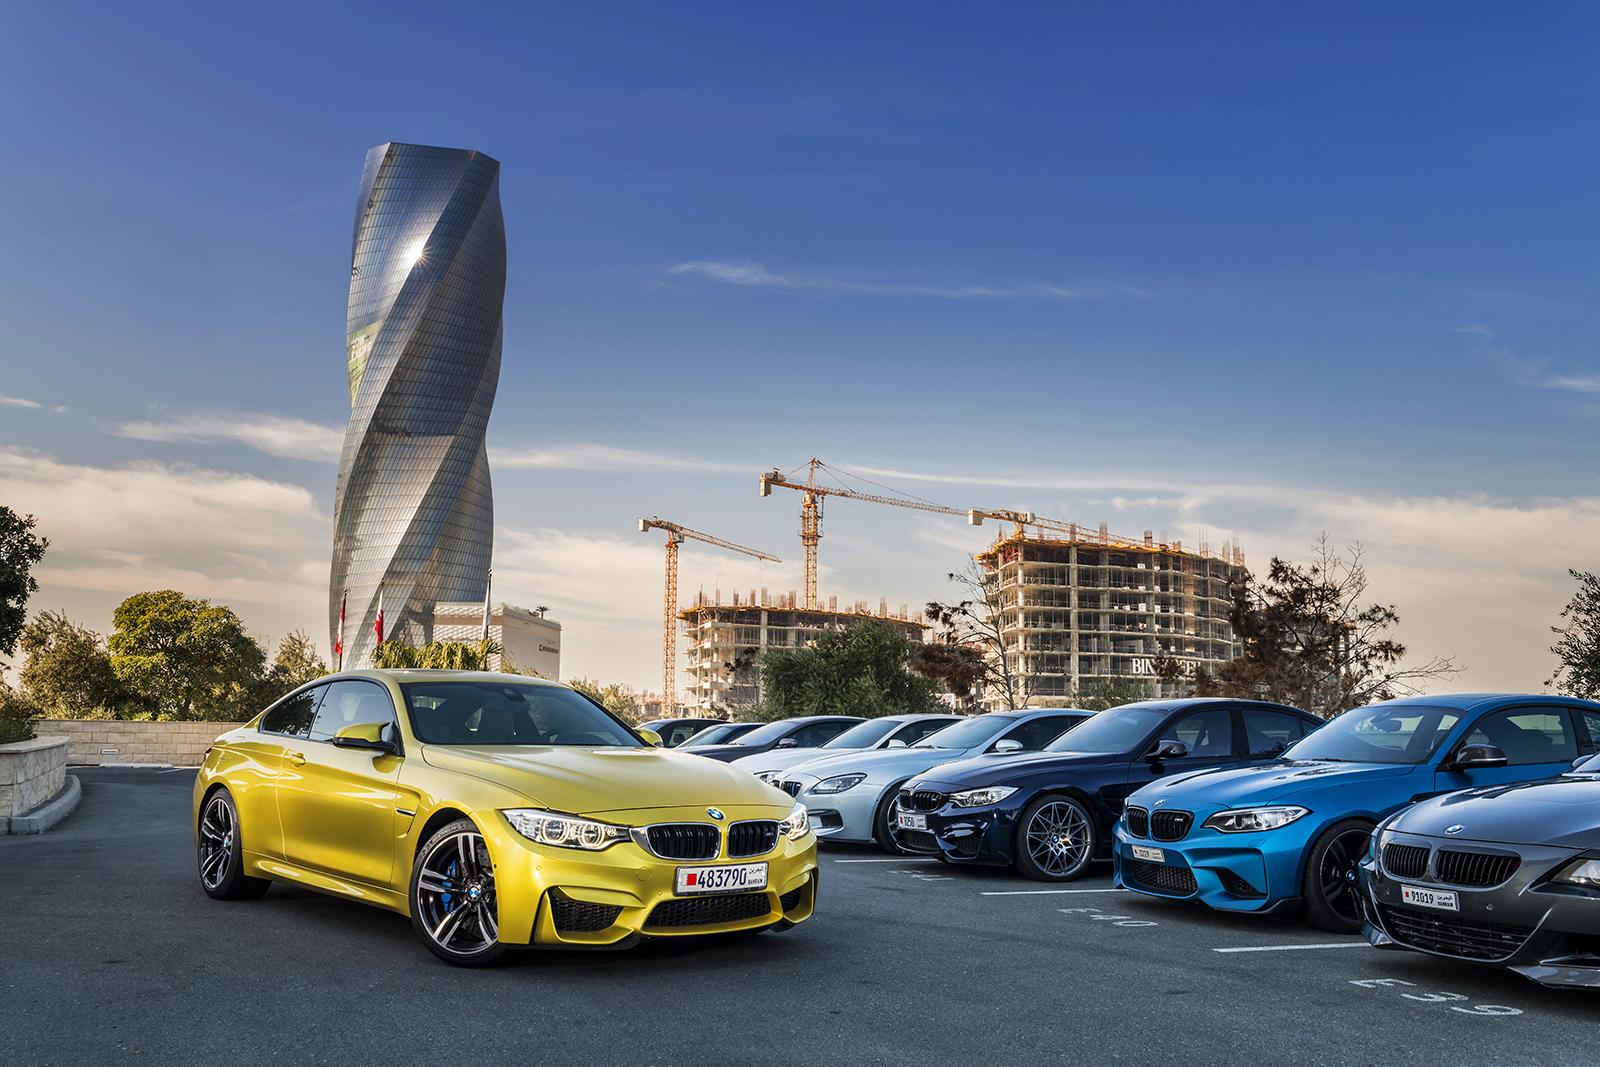 BMW M3 BMW M Event 2017 - Ali Haji.jpg